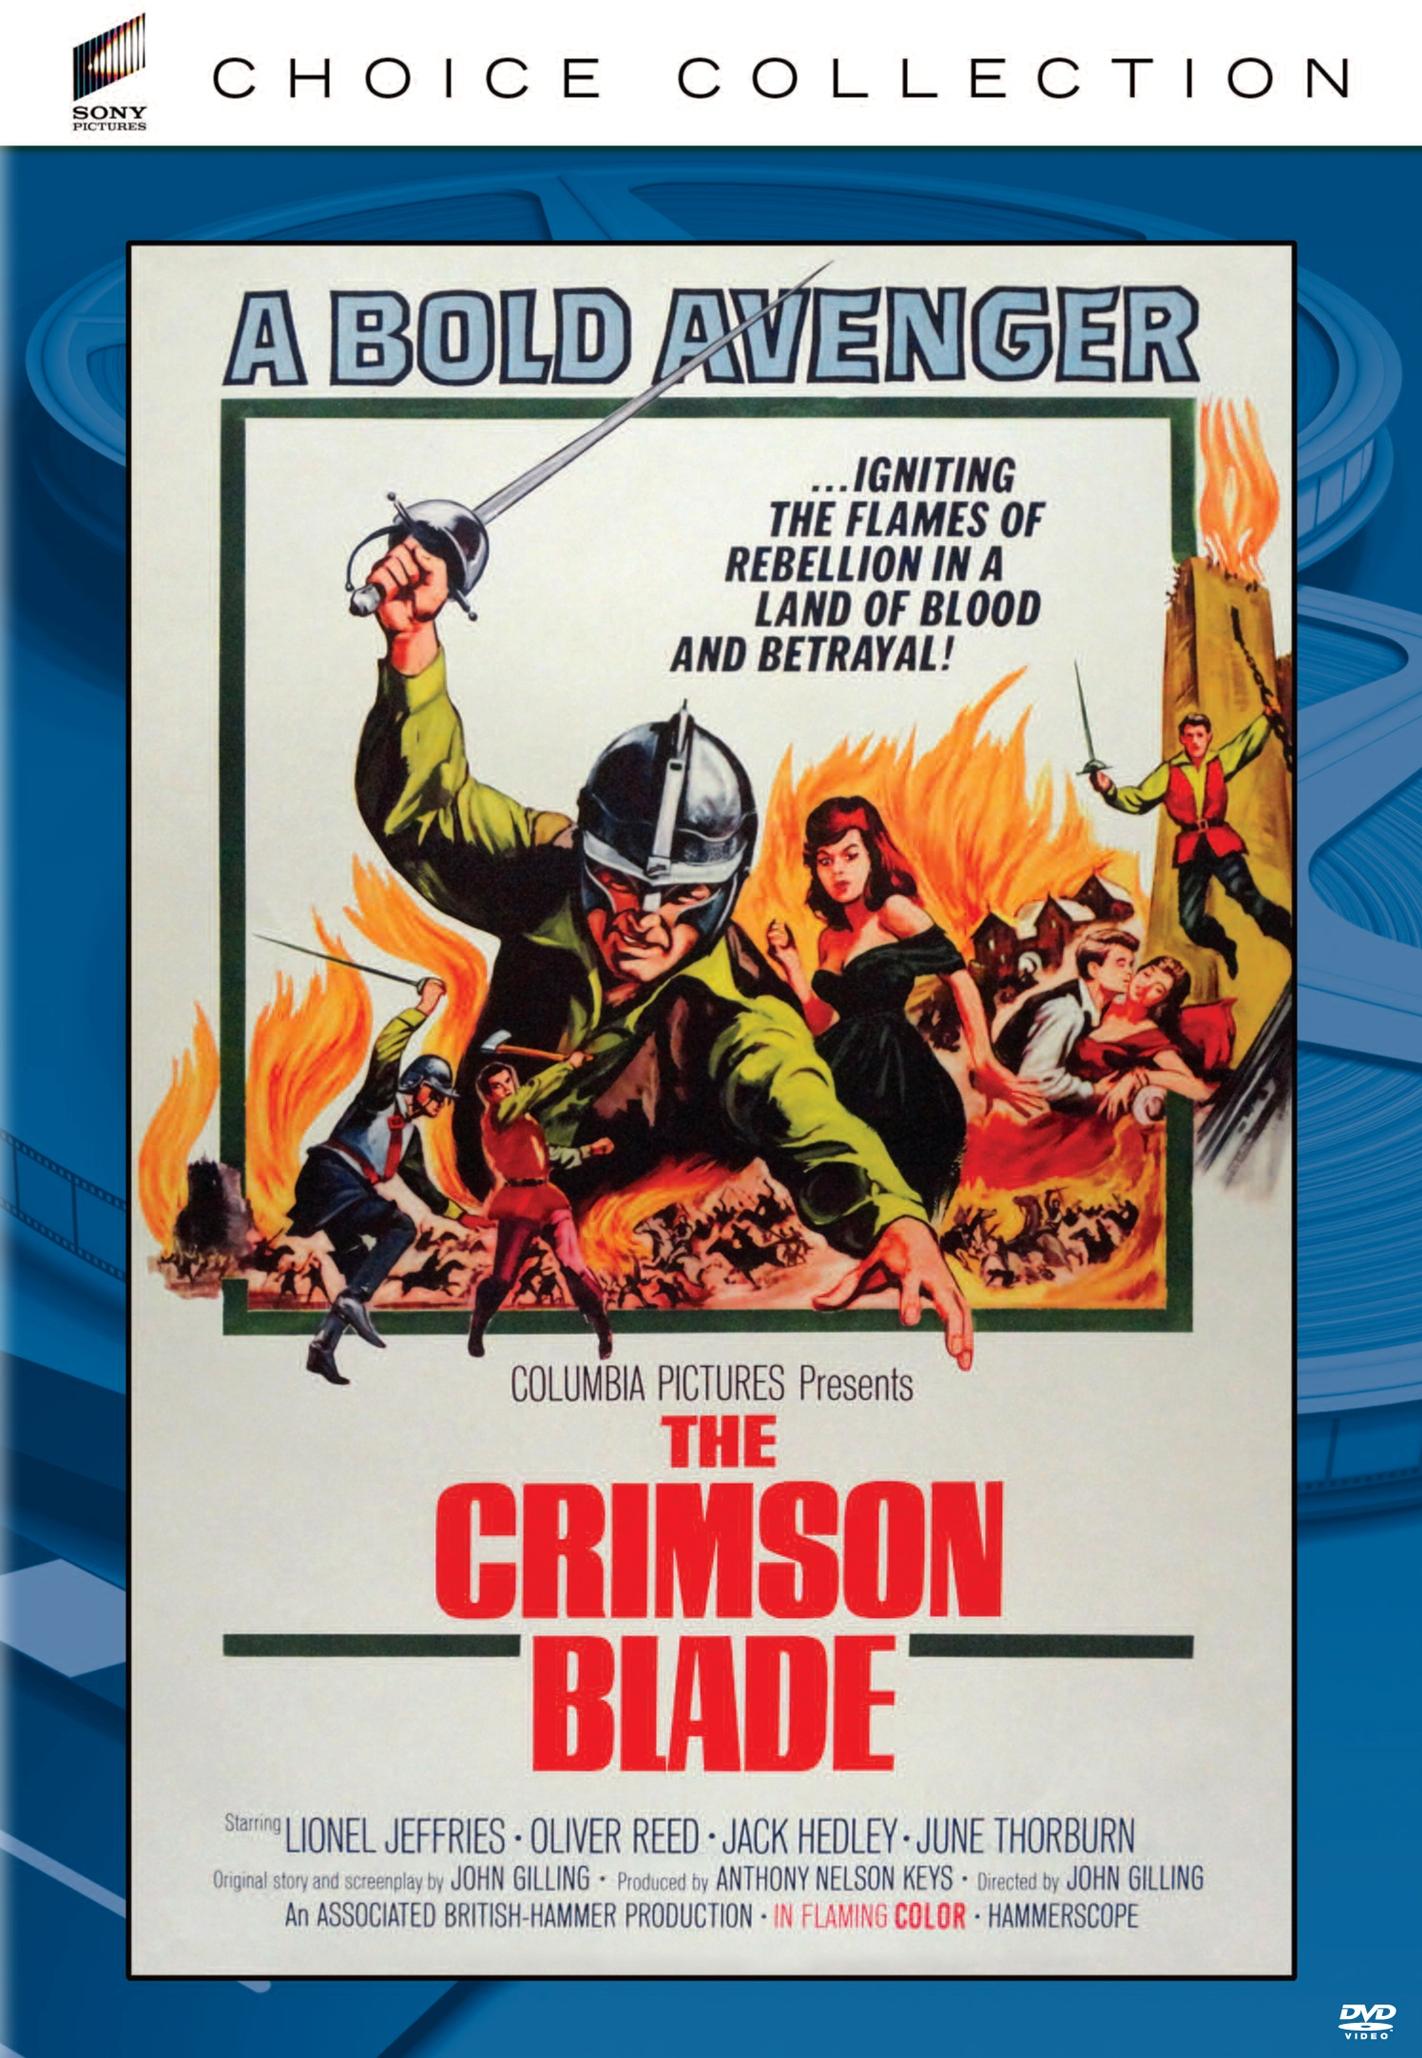 The Crimson Blade